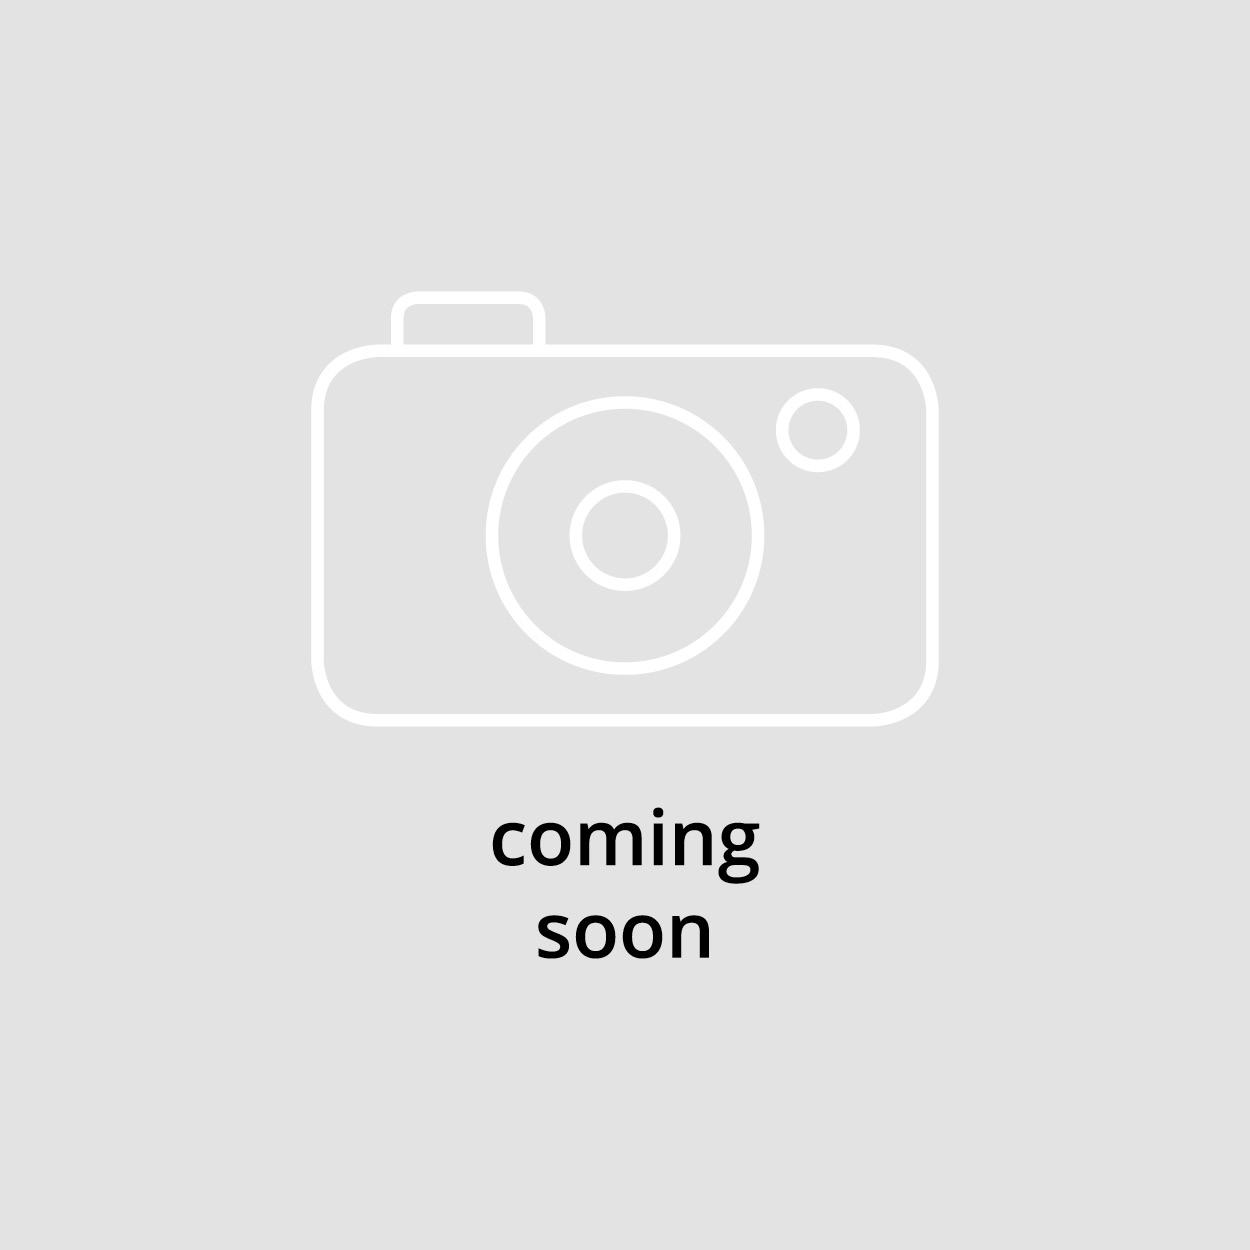 08.18.007 Molla per Portabarre Gildemeister AS16, AS20, GS20, GM20, GM20AC